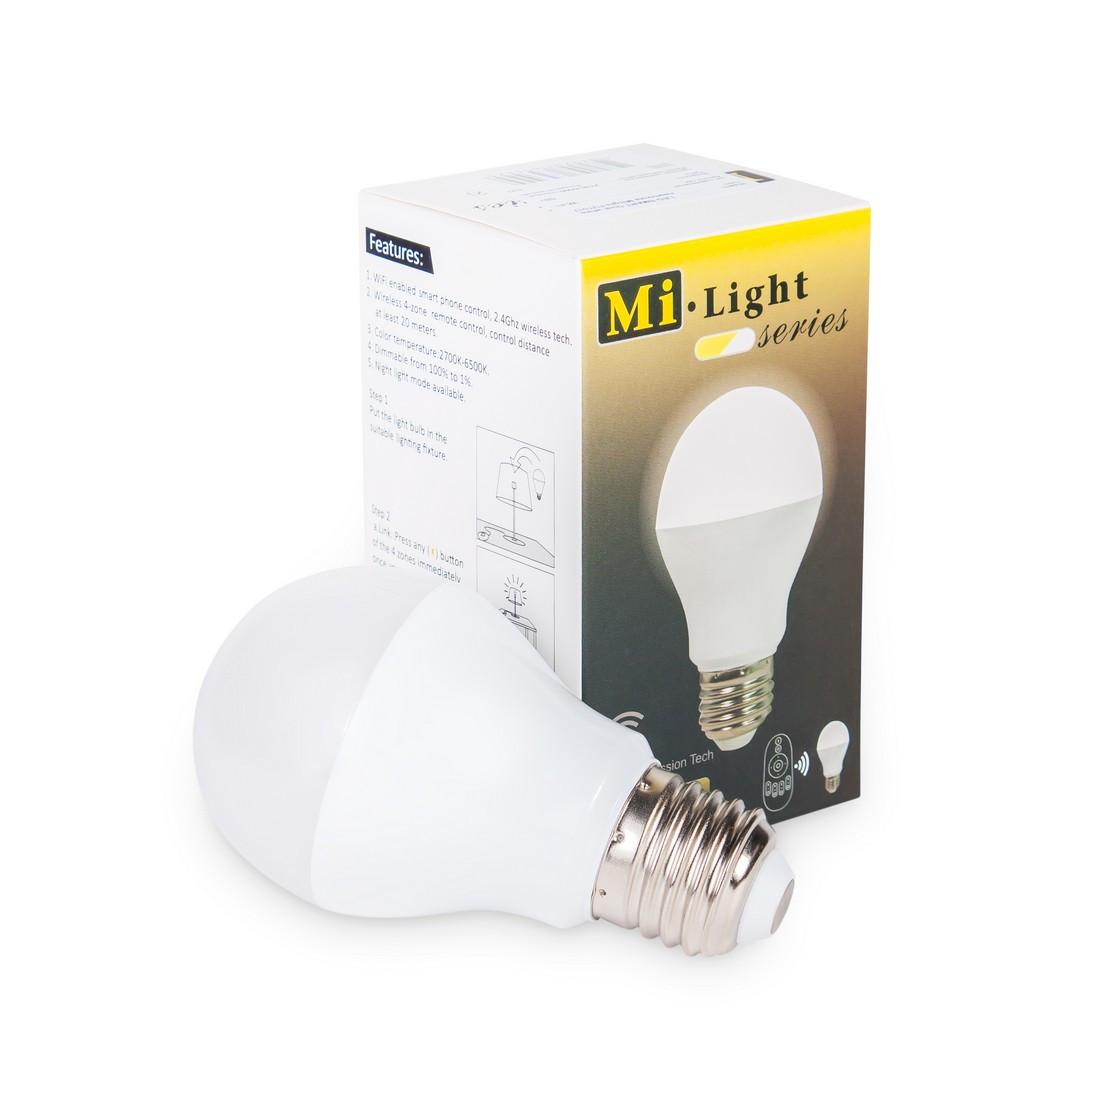 Светодиодная лампа Milight FUT017 WIFI 6Вт 2700-6500K